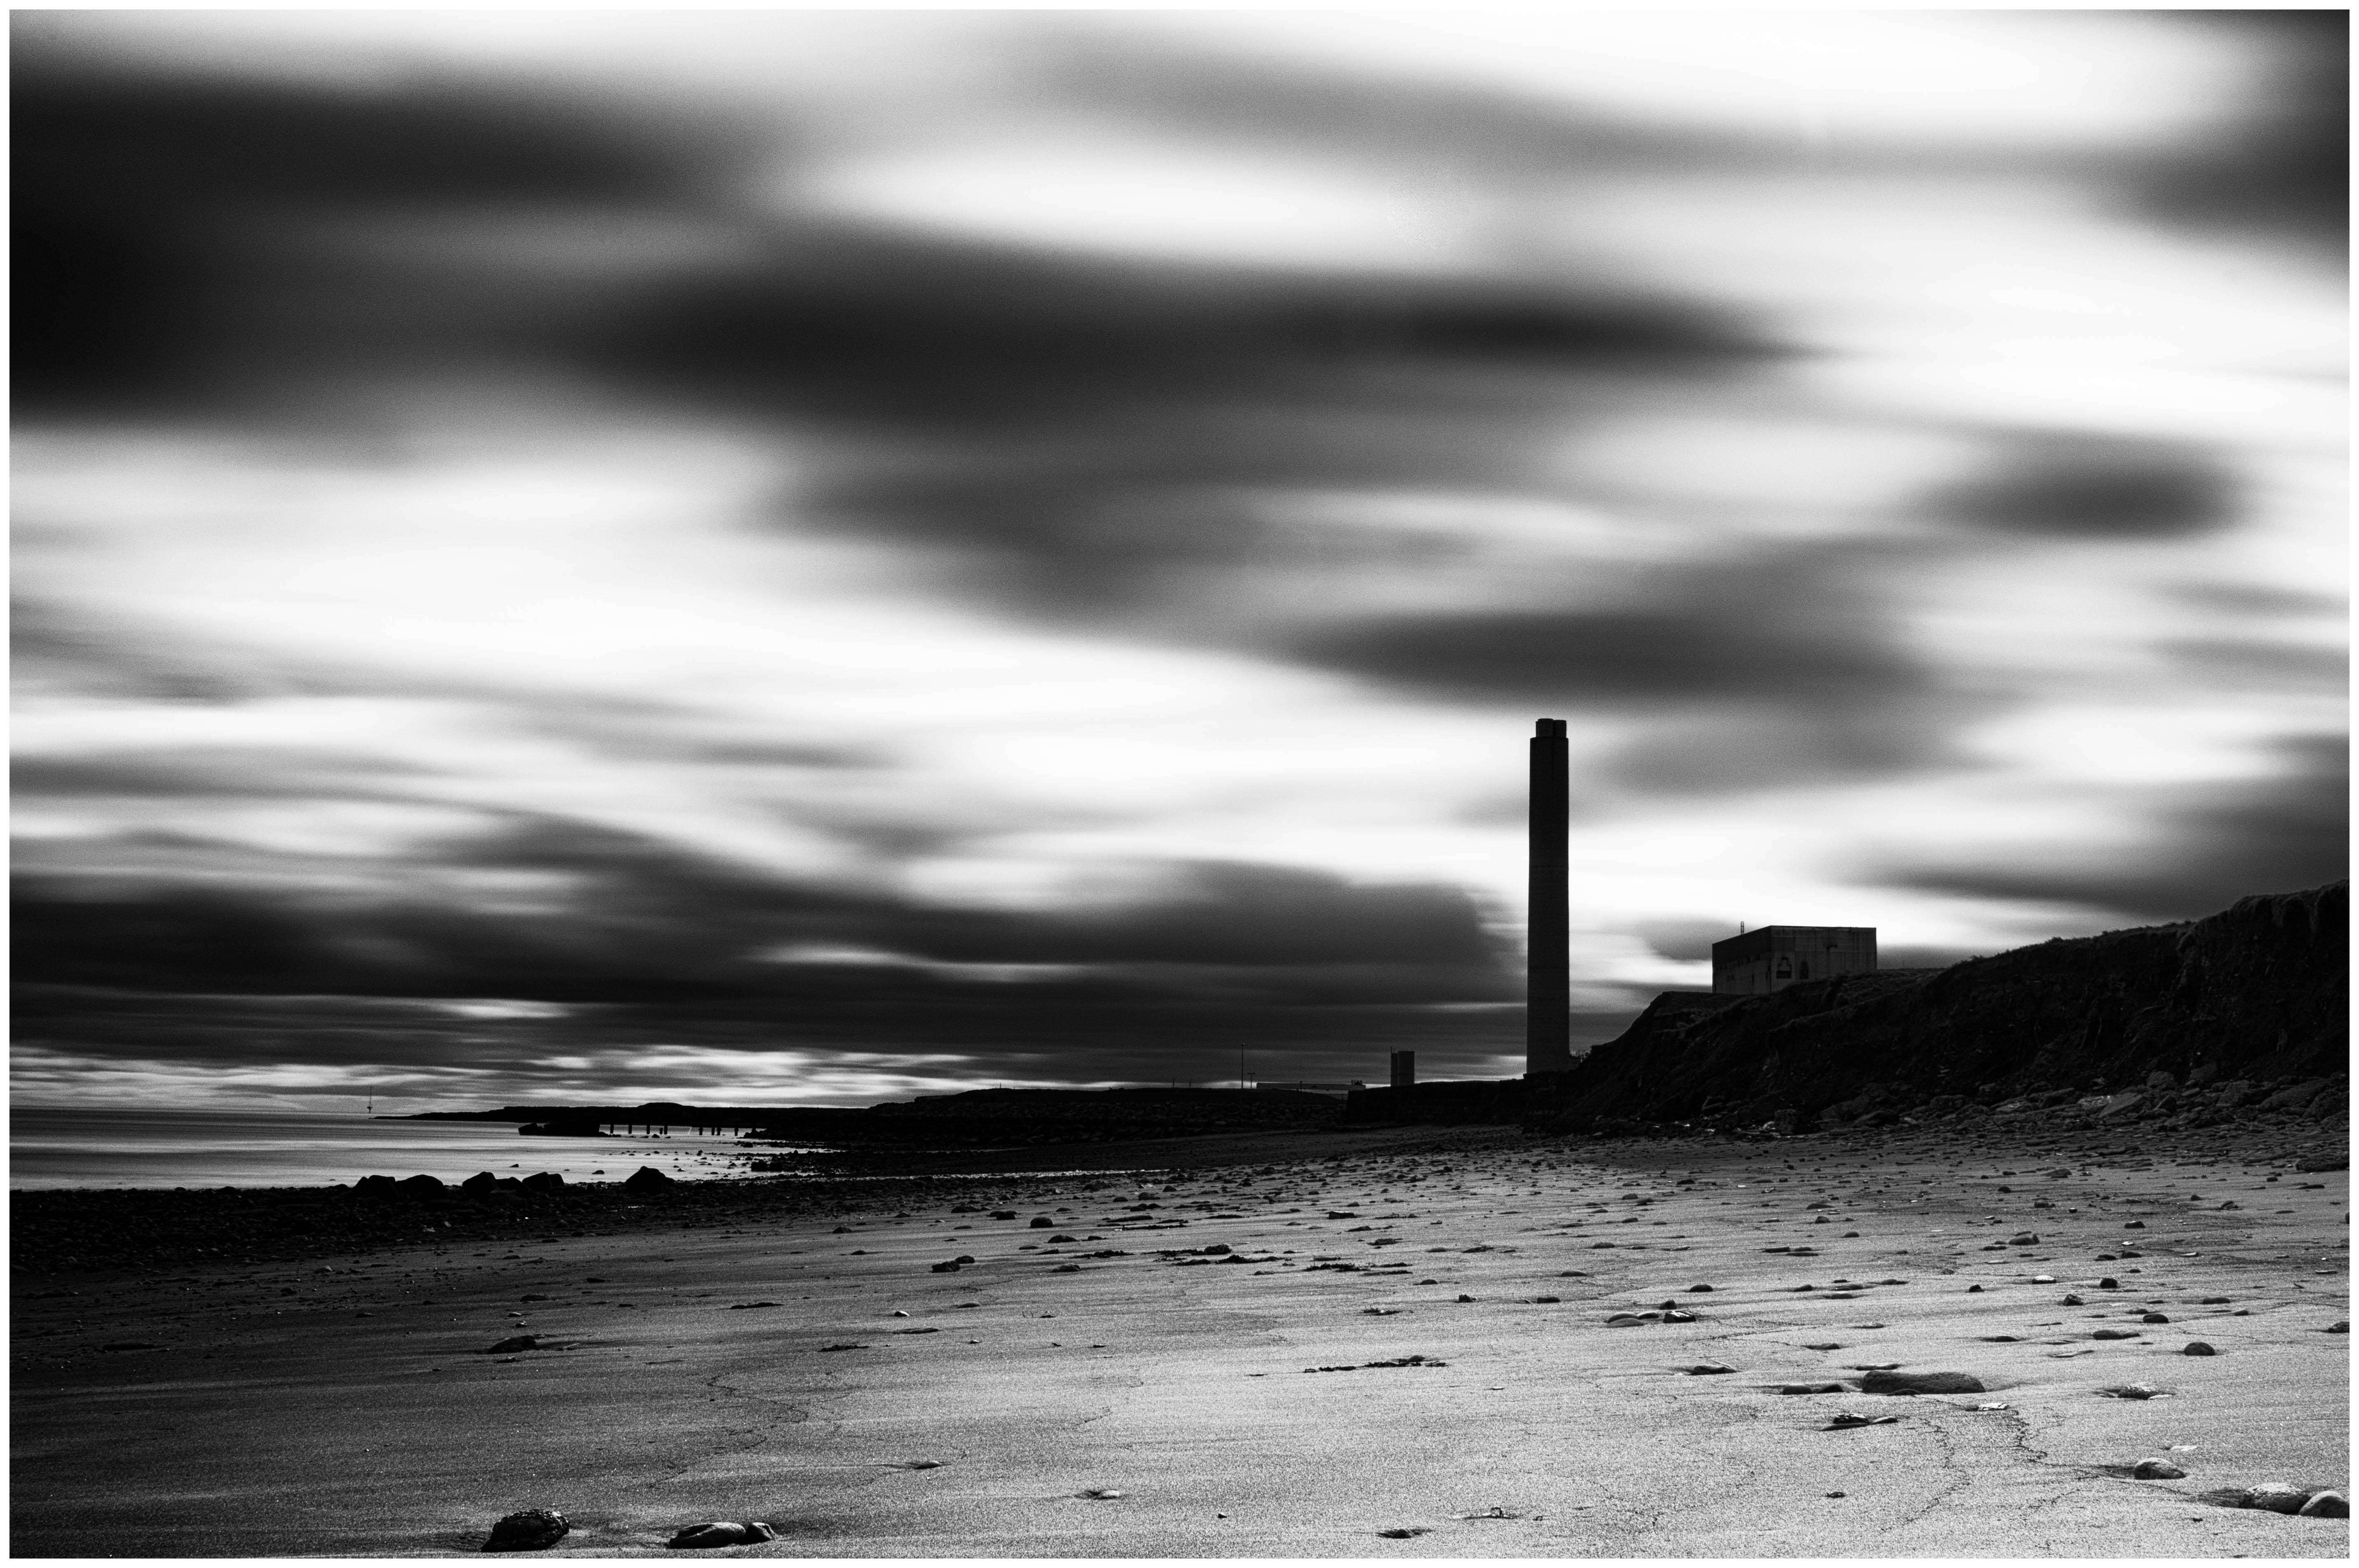 Schwarz weiß fotografie strand